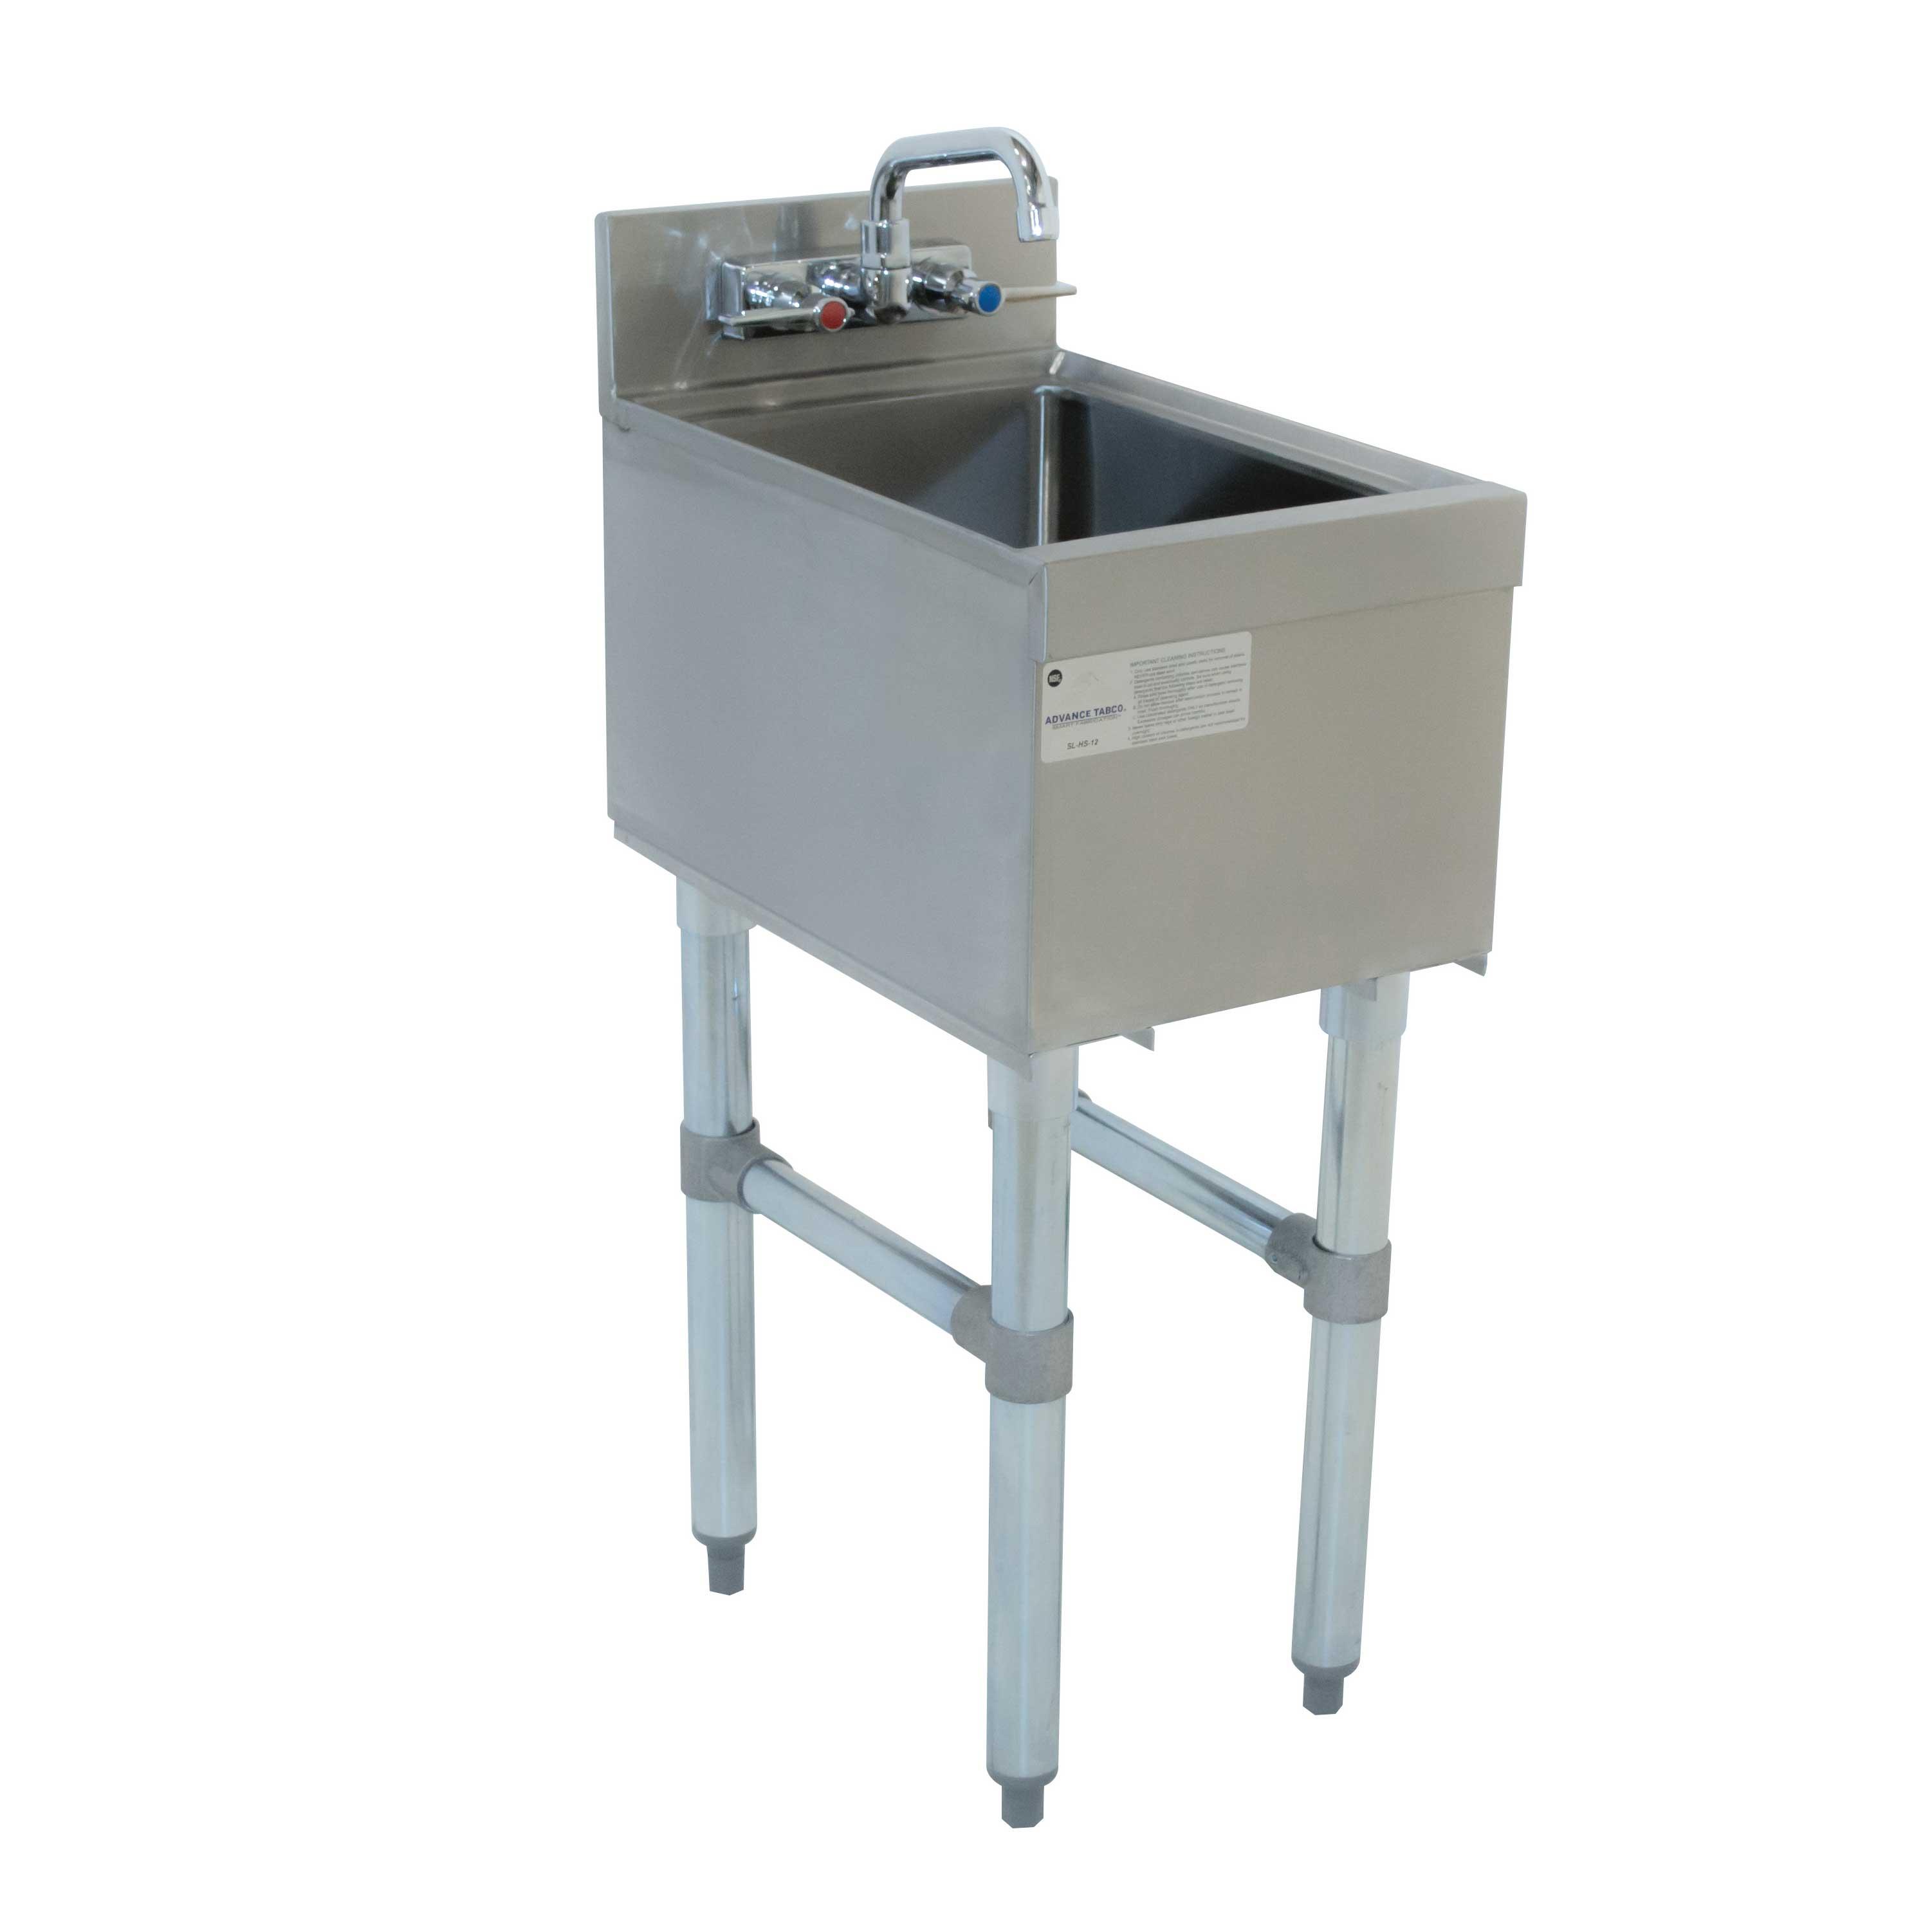 Advance Tabco SL-HS-15 underbar hand sink unit